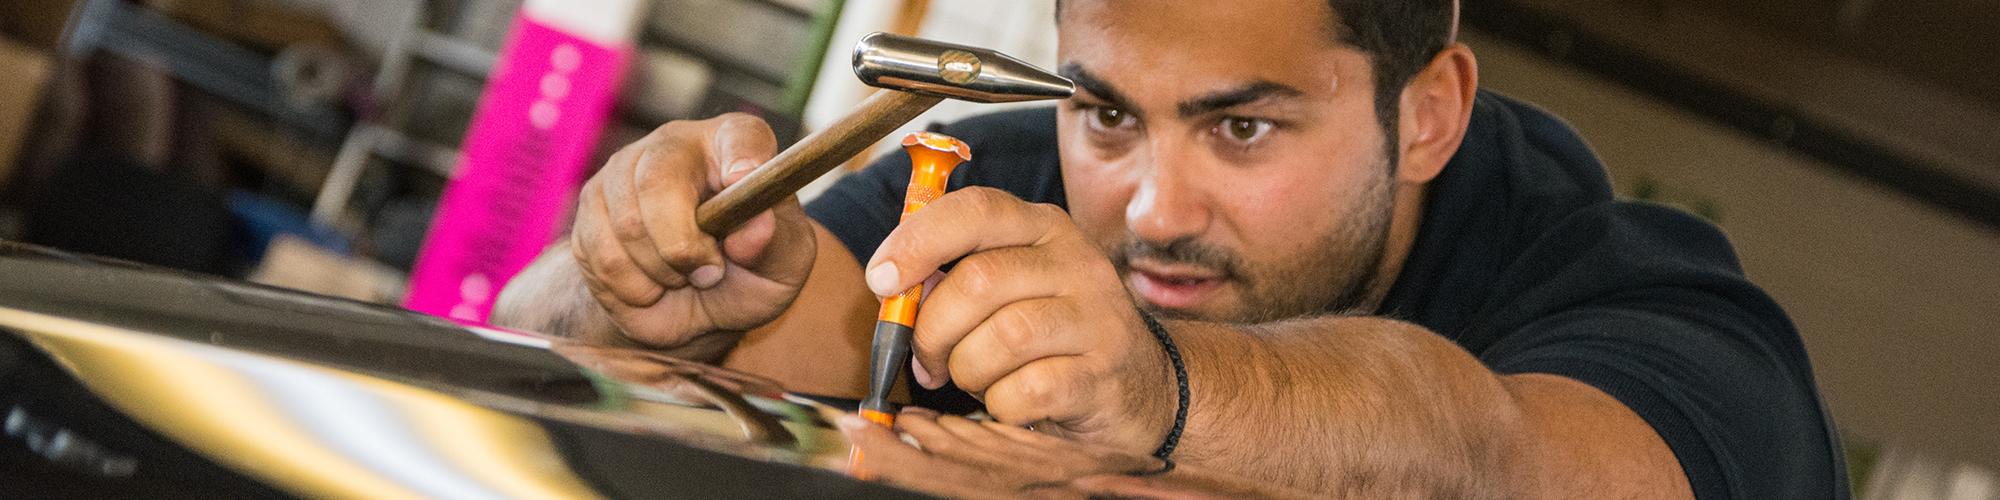 Ausbeulen lackierfrei schonend Smart Repair